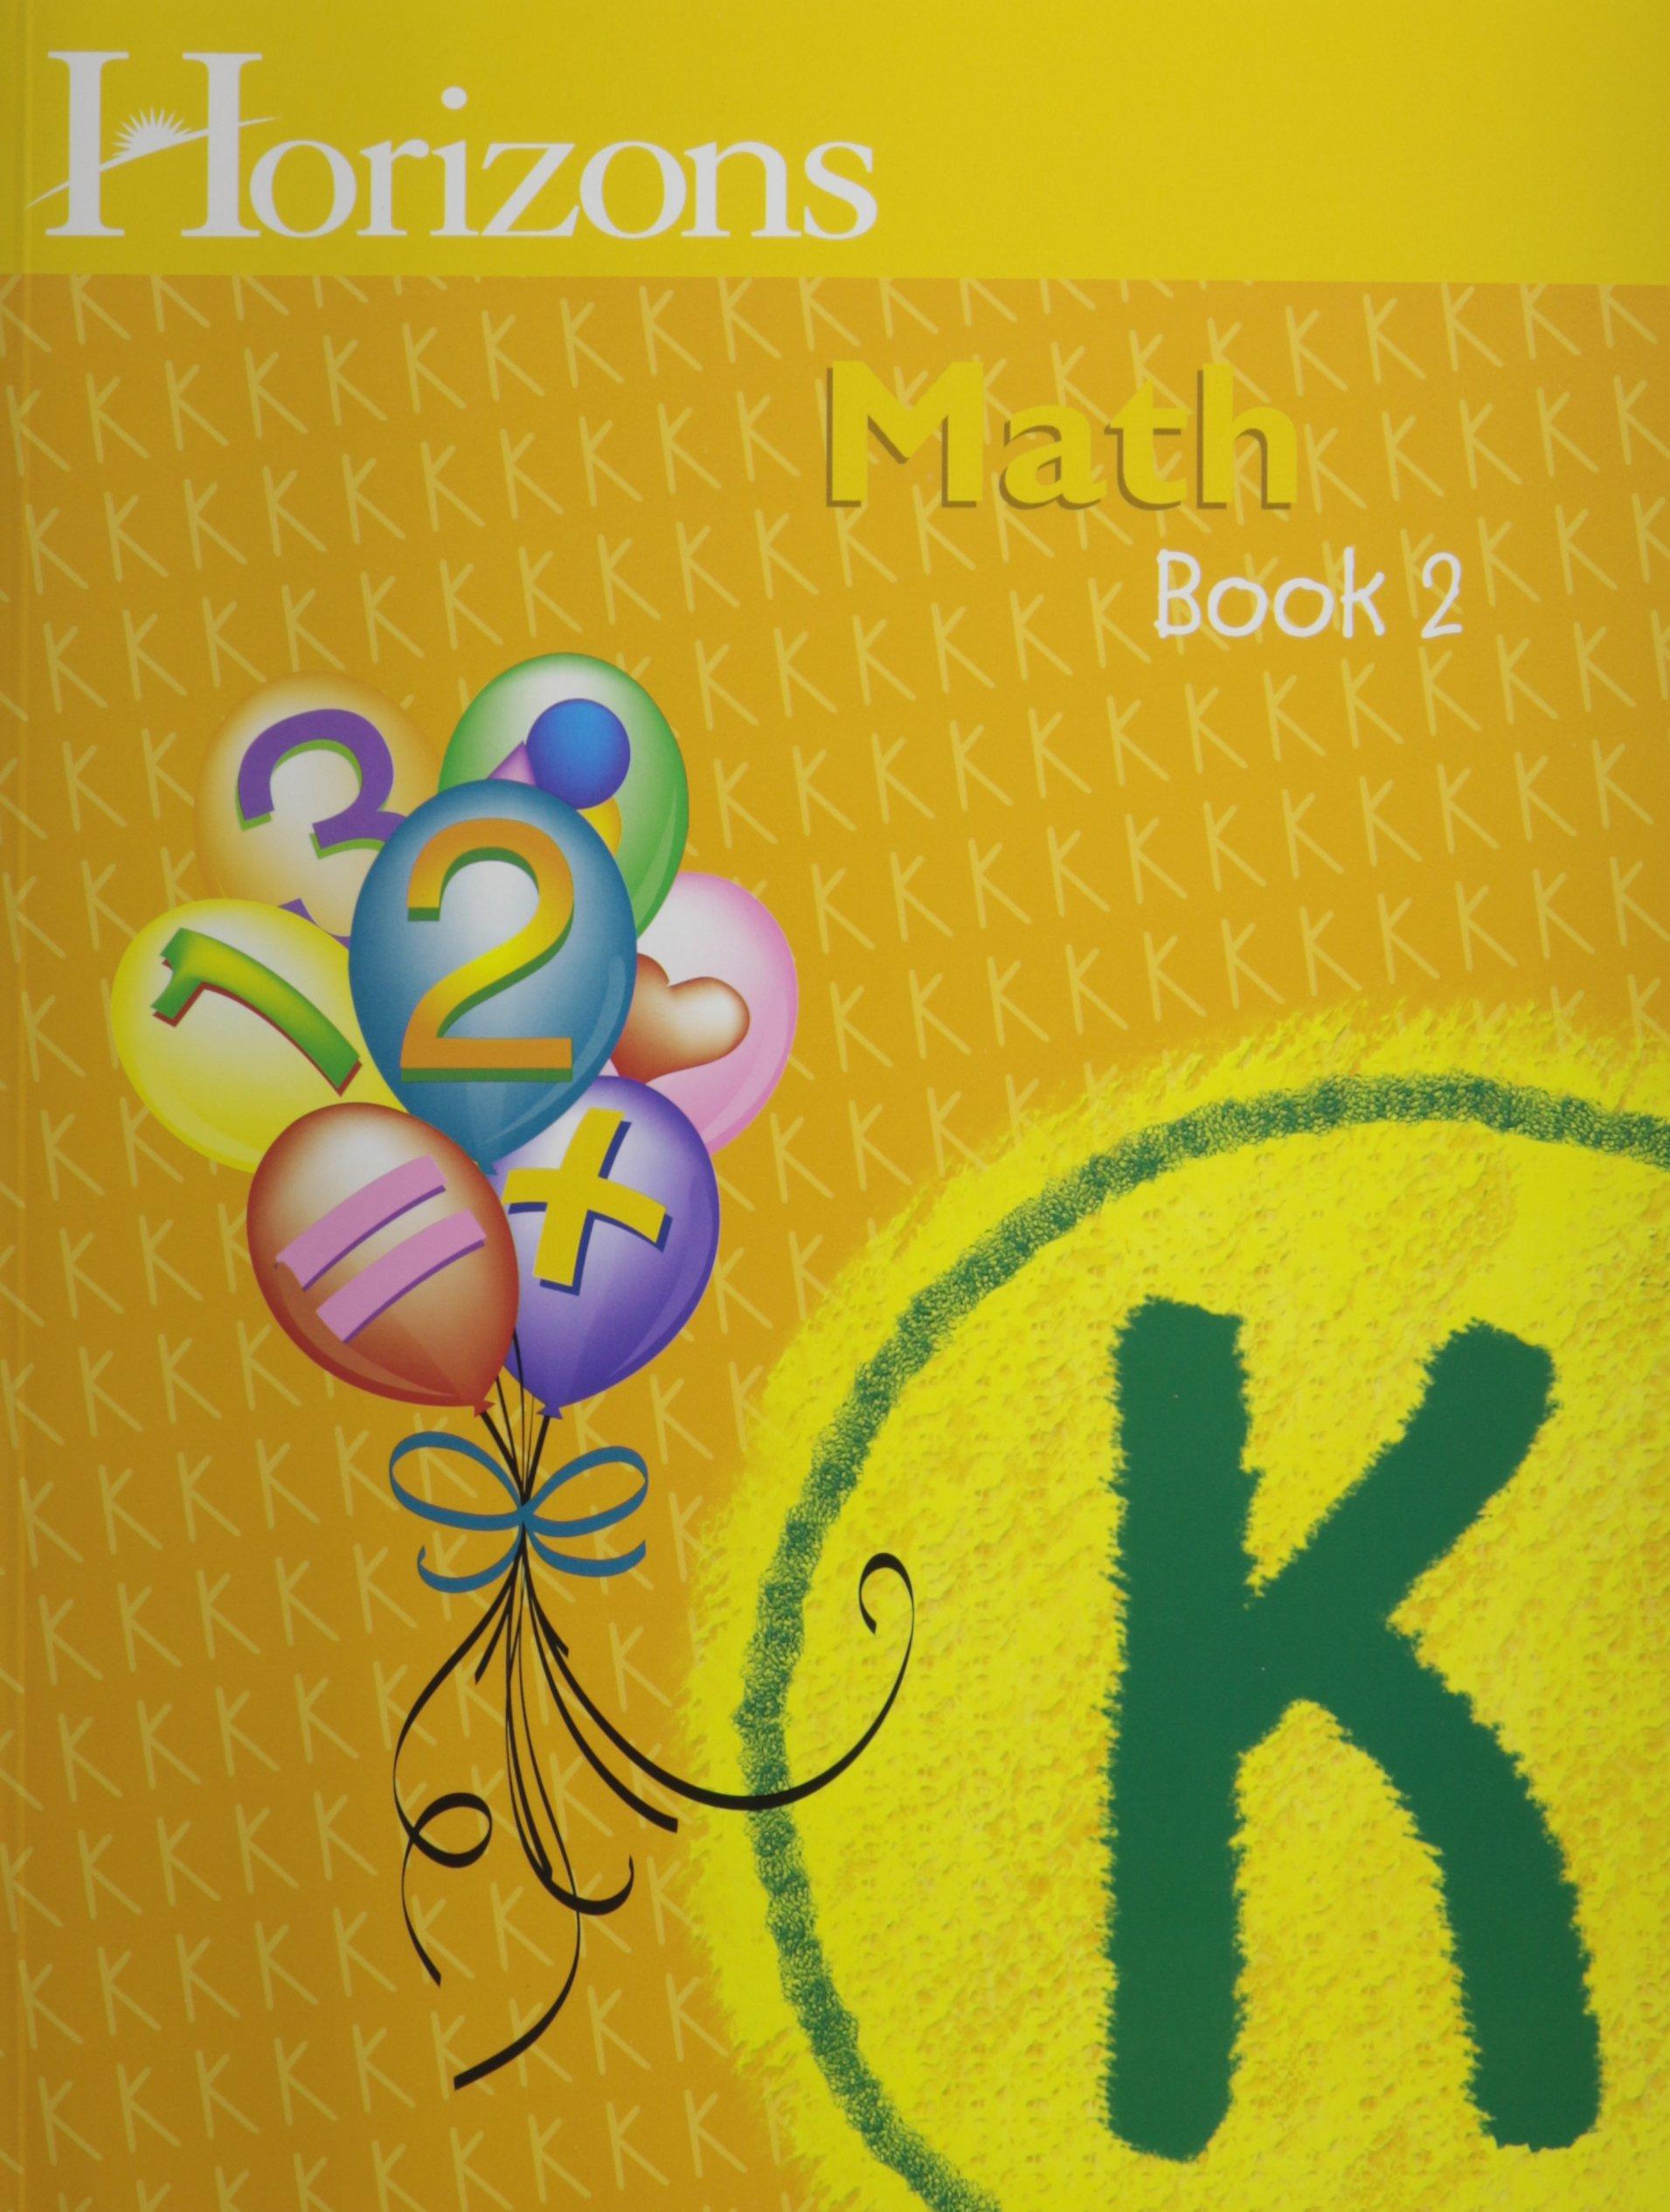 Horizons Math K SET of 2 Student Workbooks K-1 and K-2: Alan  Christopherson: 9780740325298: Amazon.com: Books